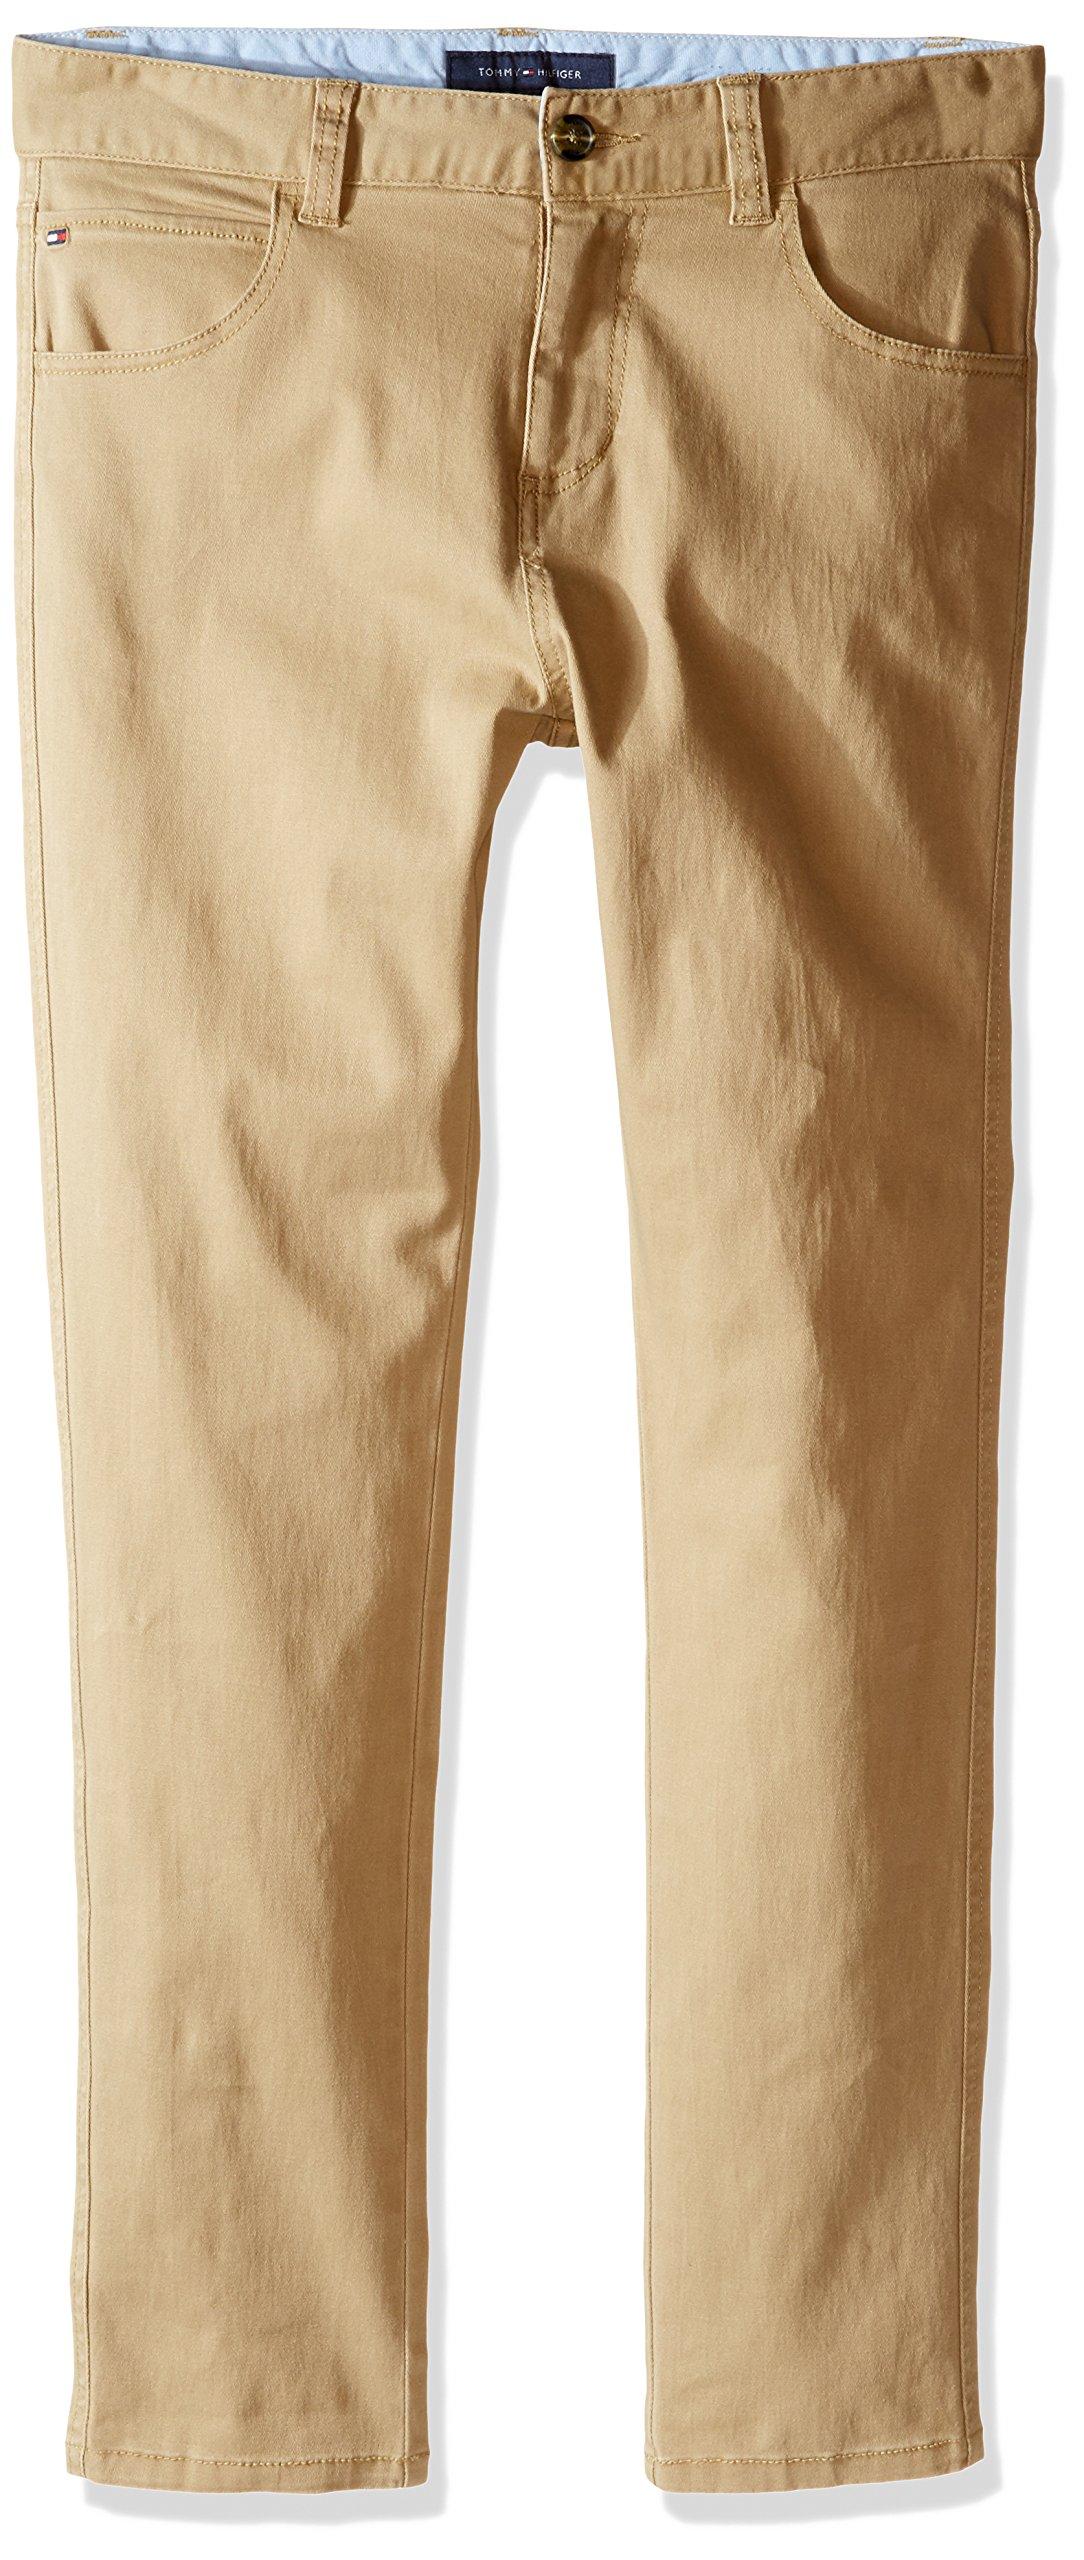 Tommy Hilfiger Big Boys 5 Pocket Trent Pant, TH Chino, 16